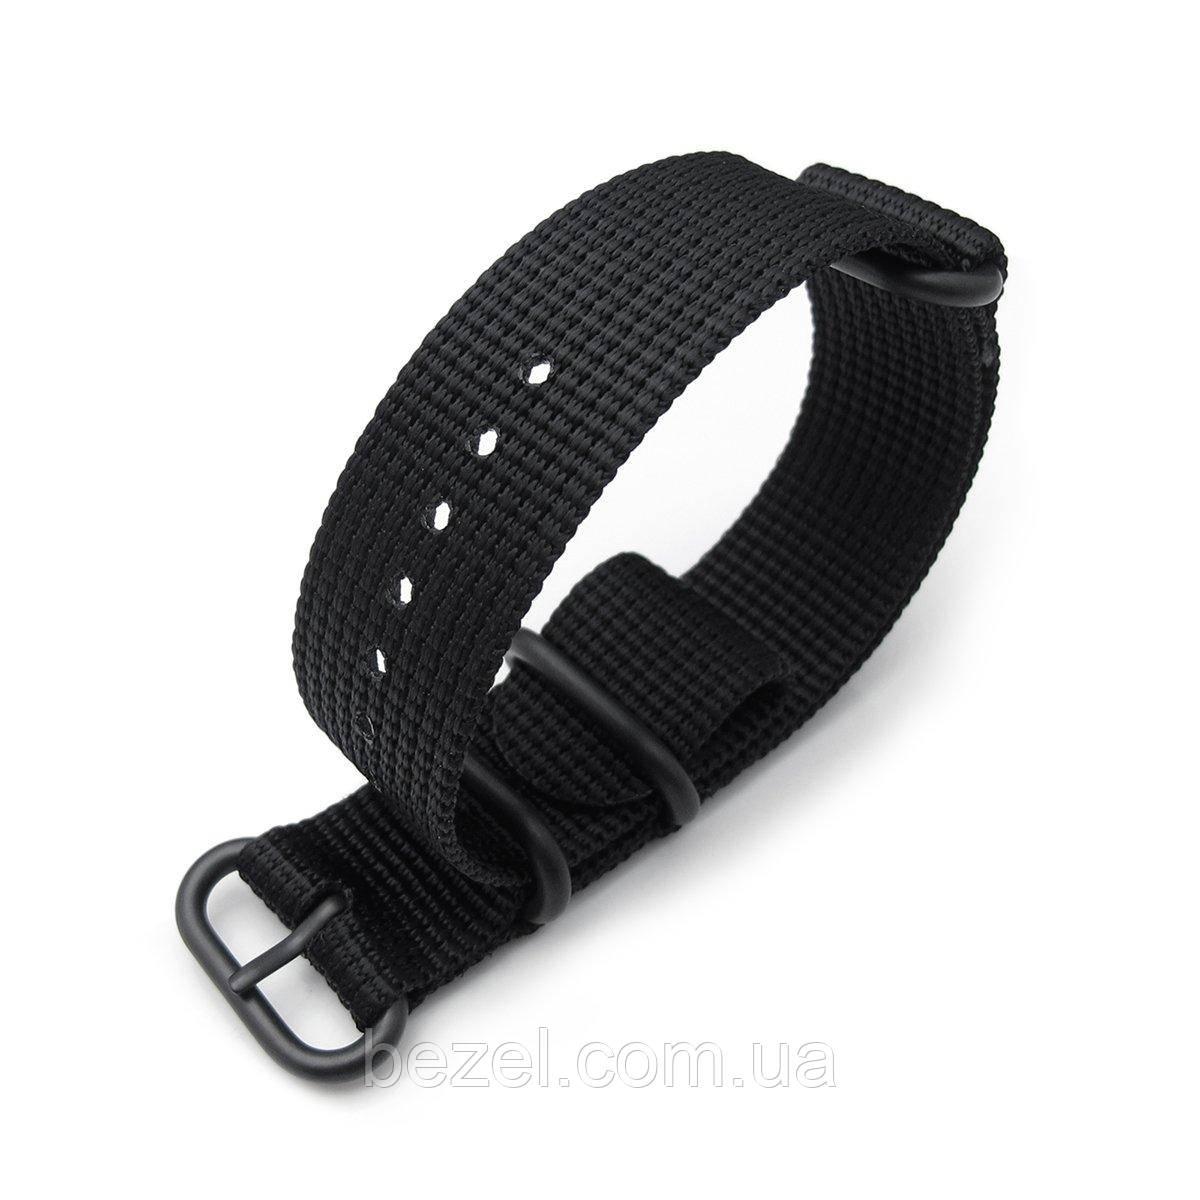 MiLTAT 3 Rings Zulu military watch strap 3D woven nylon armband - Black, PVD Black, 18mm to 26mm